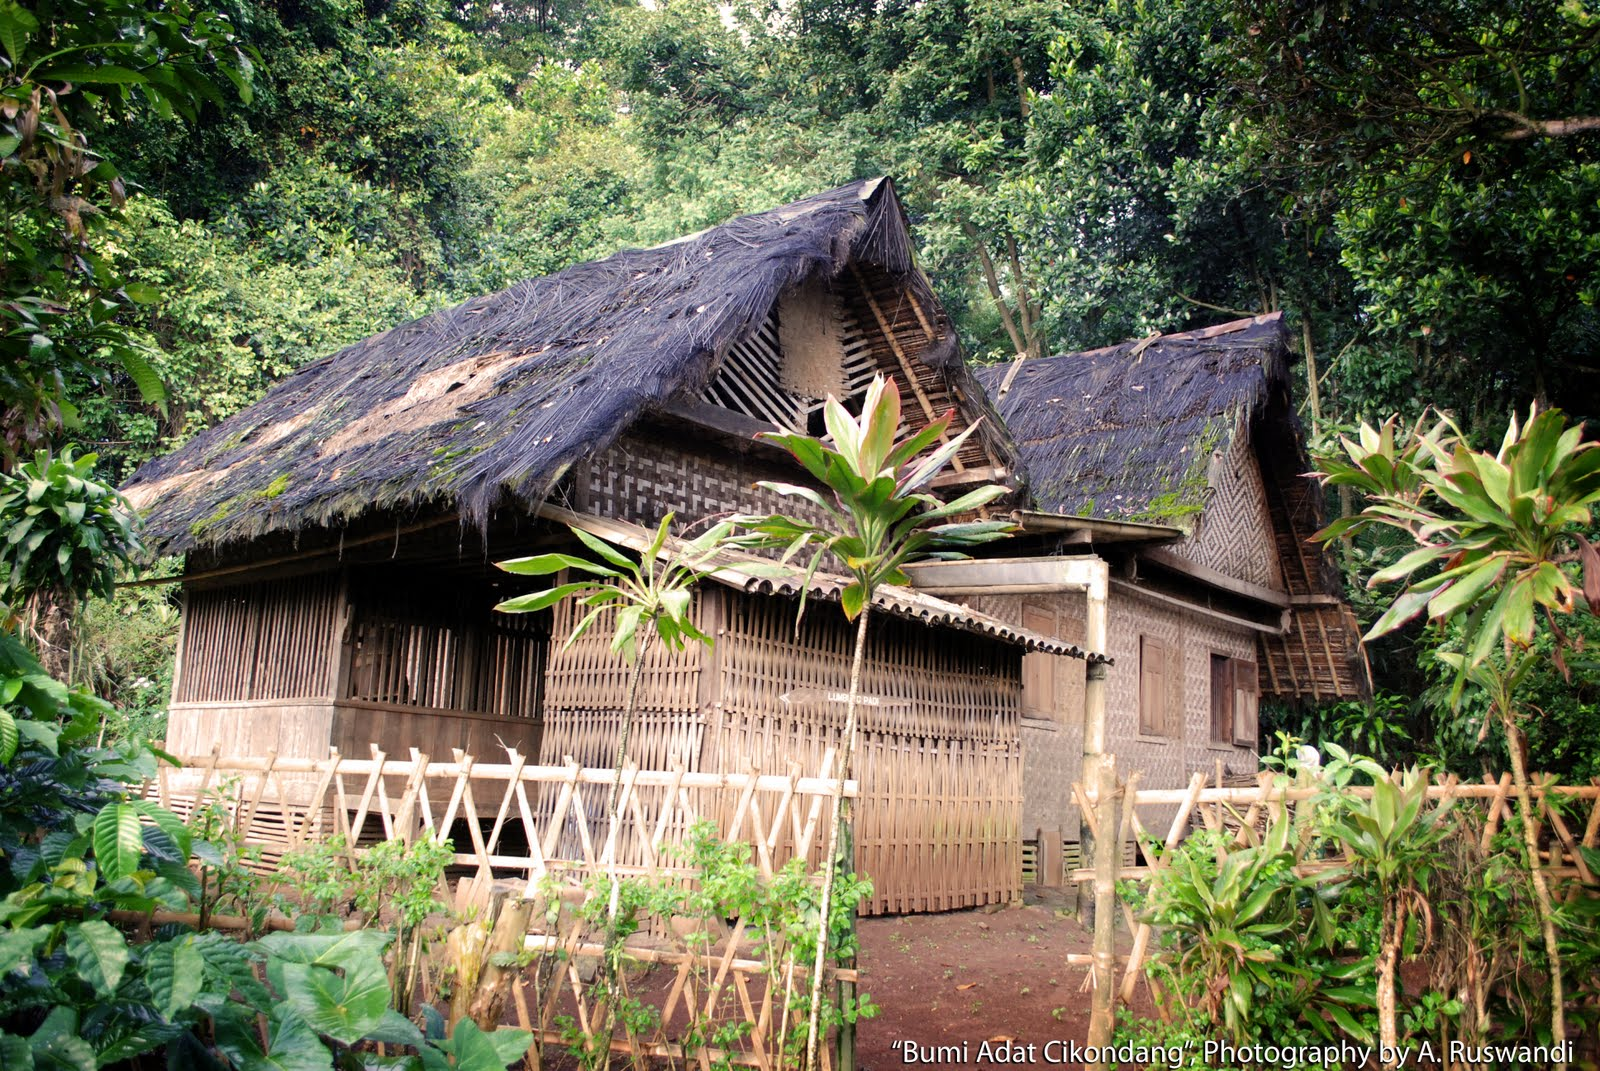 Tempat Wisata Pangalengan Bandung Jawa Barat - Outbound ...